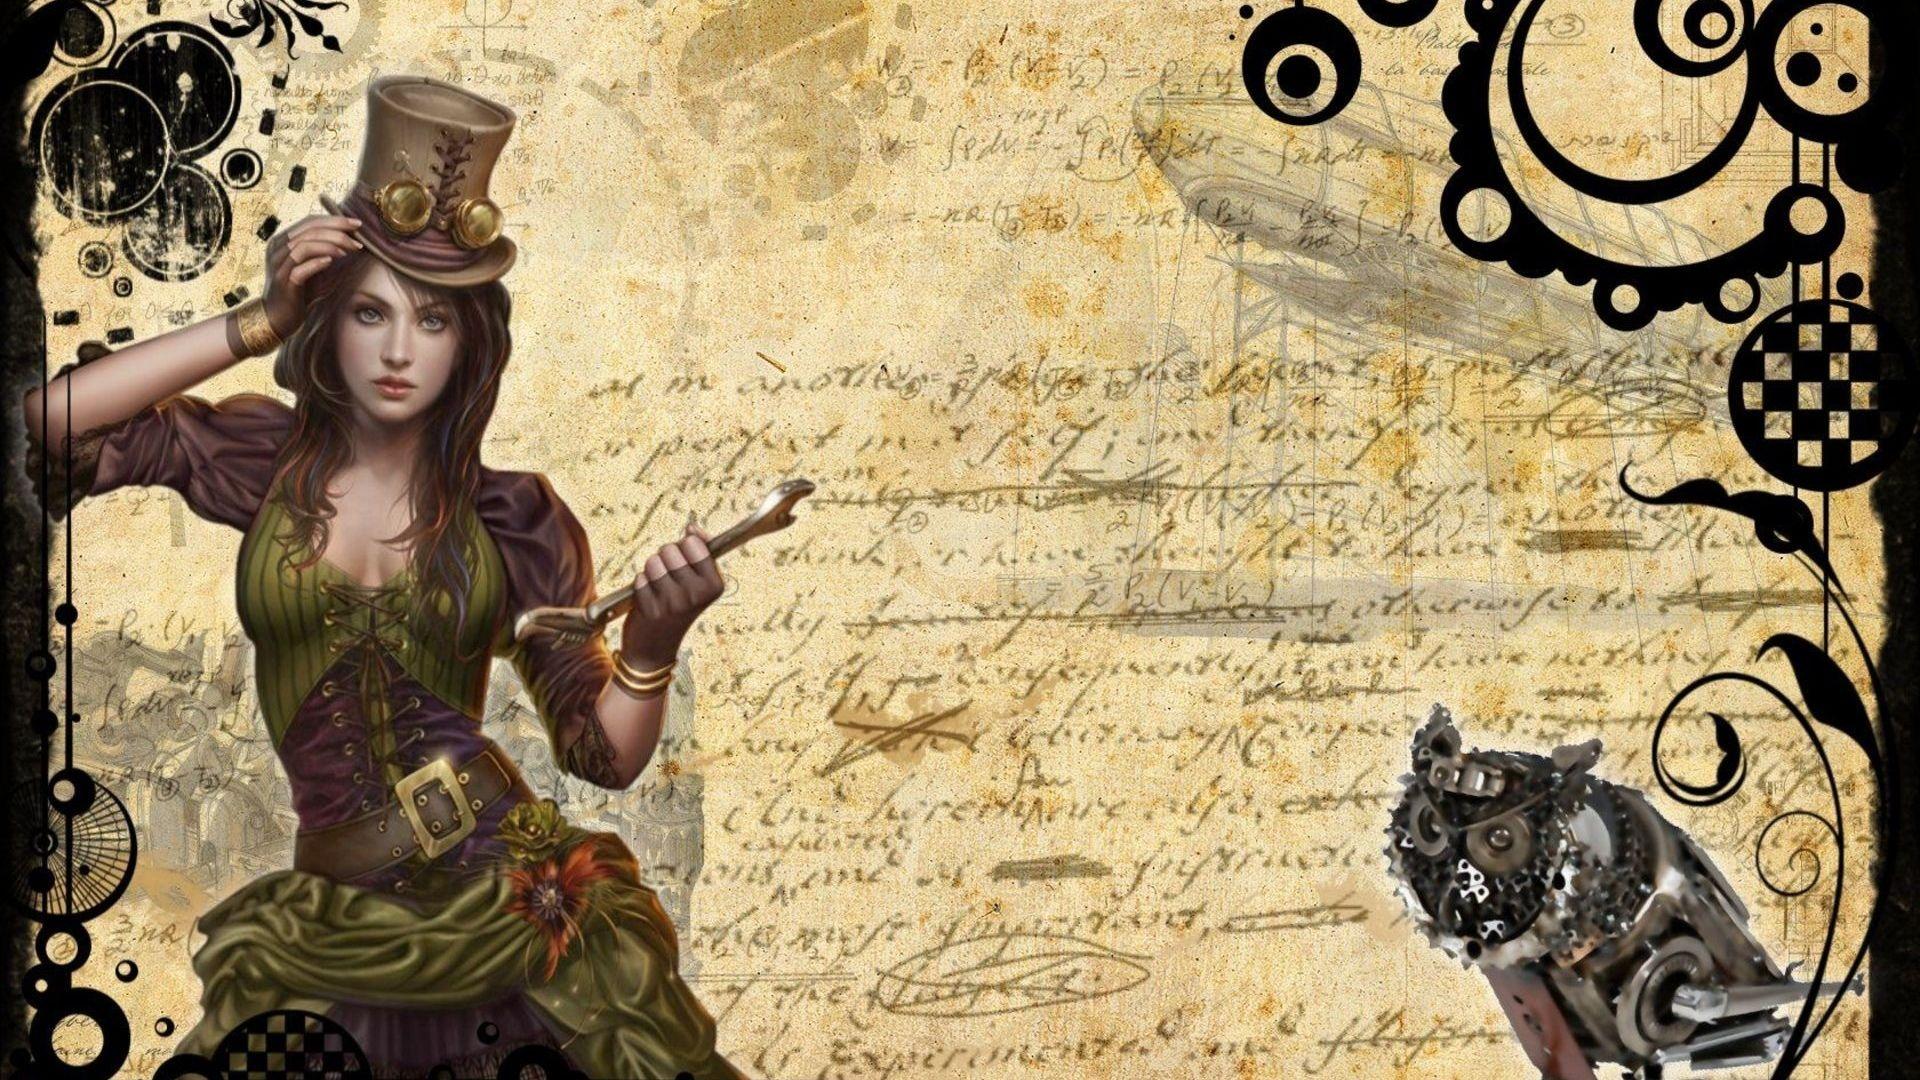 Steampunk Free Download Wallpaper